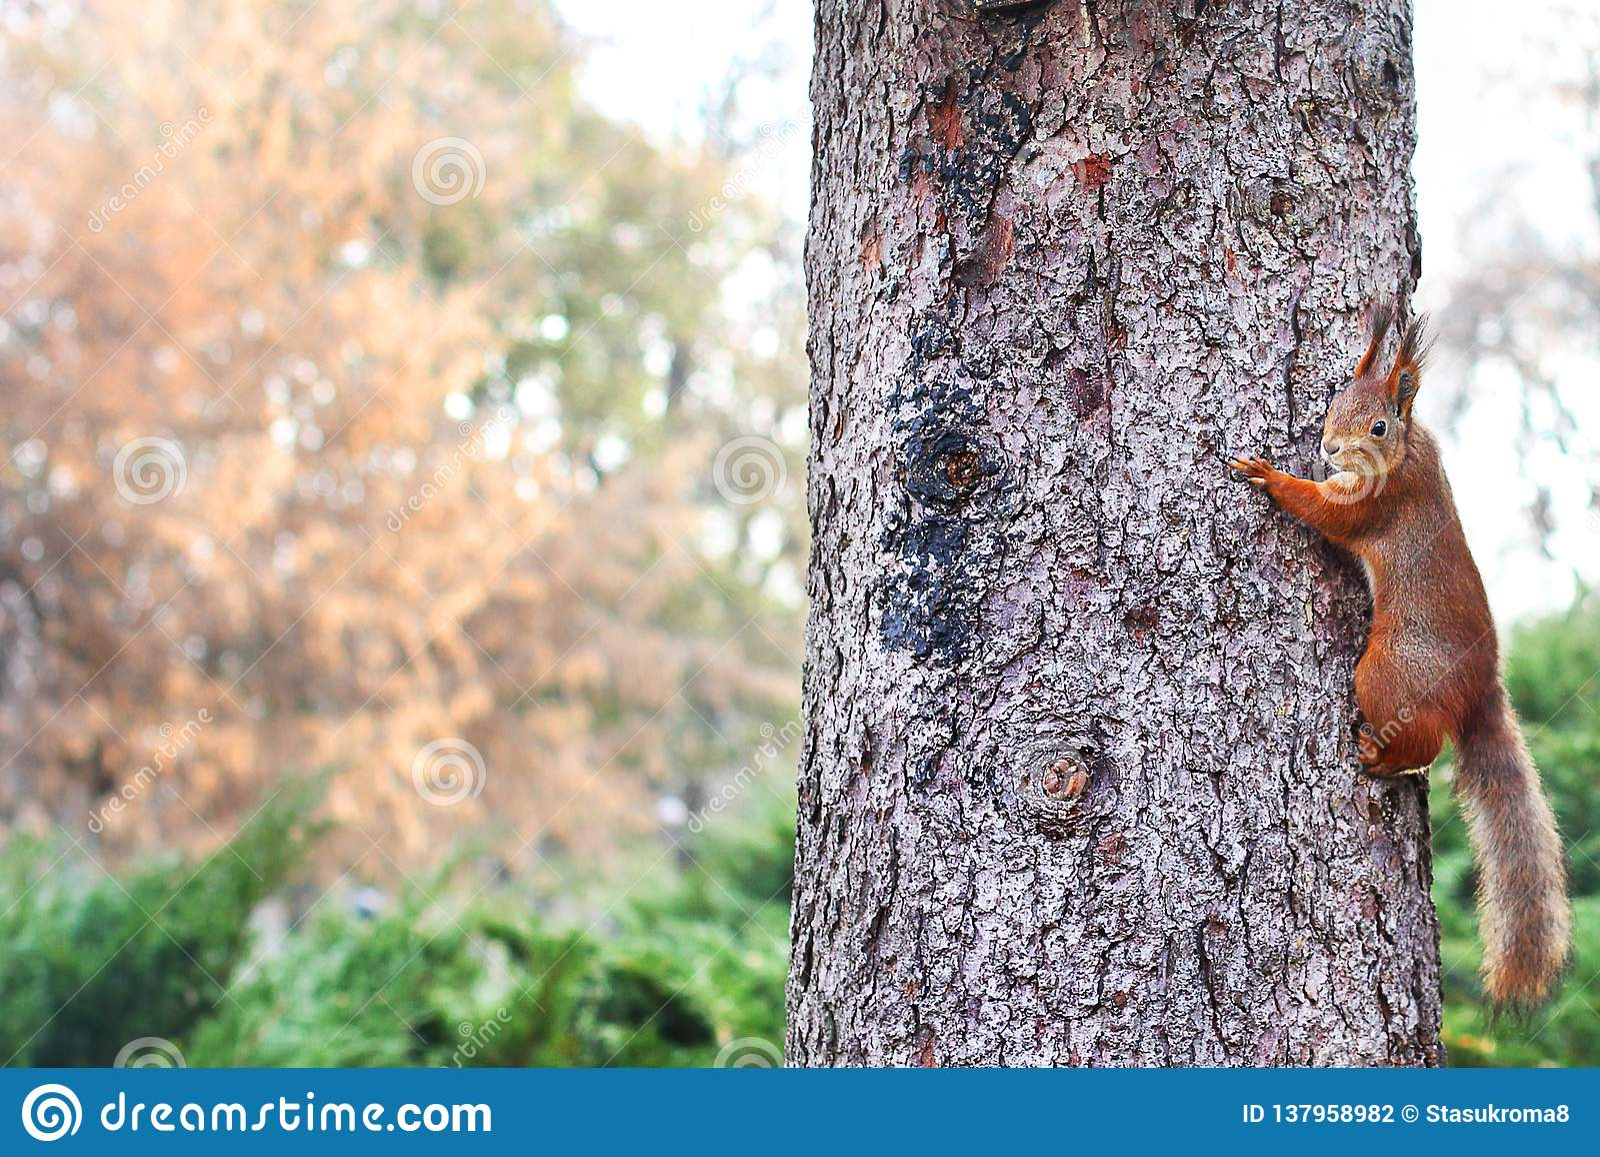 Ardilla curiosa Ardilla roja Ardilla Otoño Invierno Ardilla de Forest Beautiful